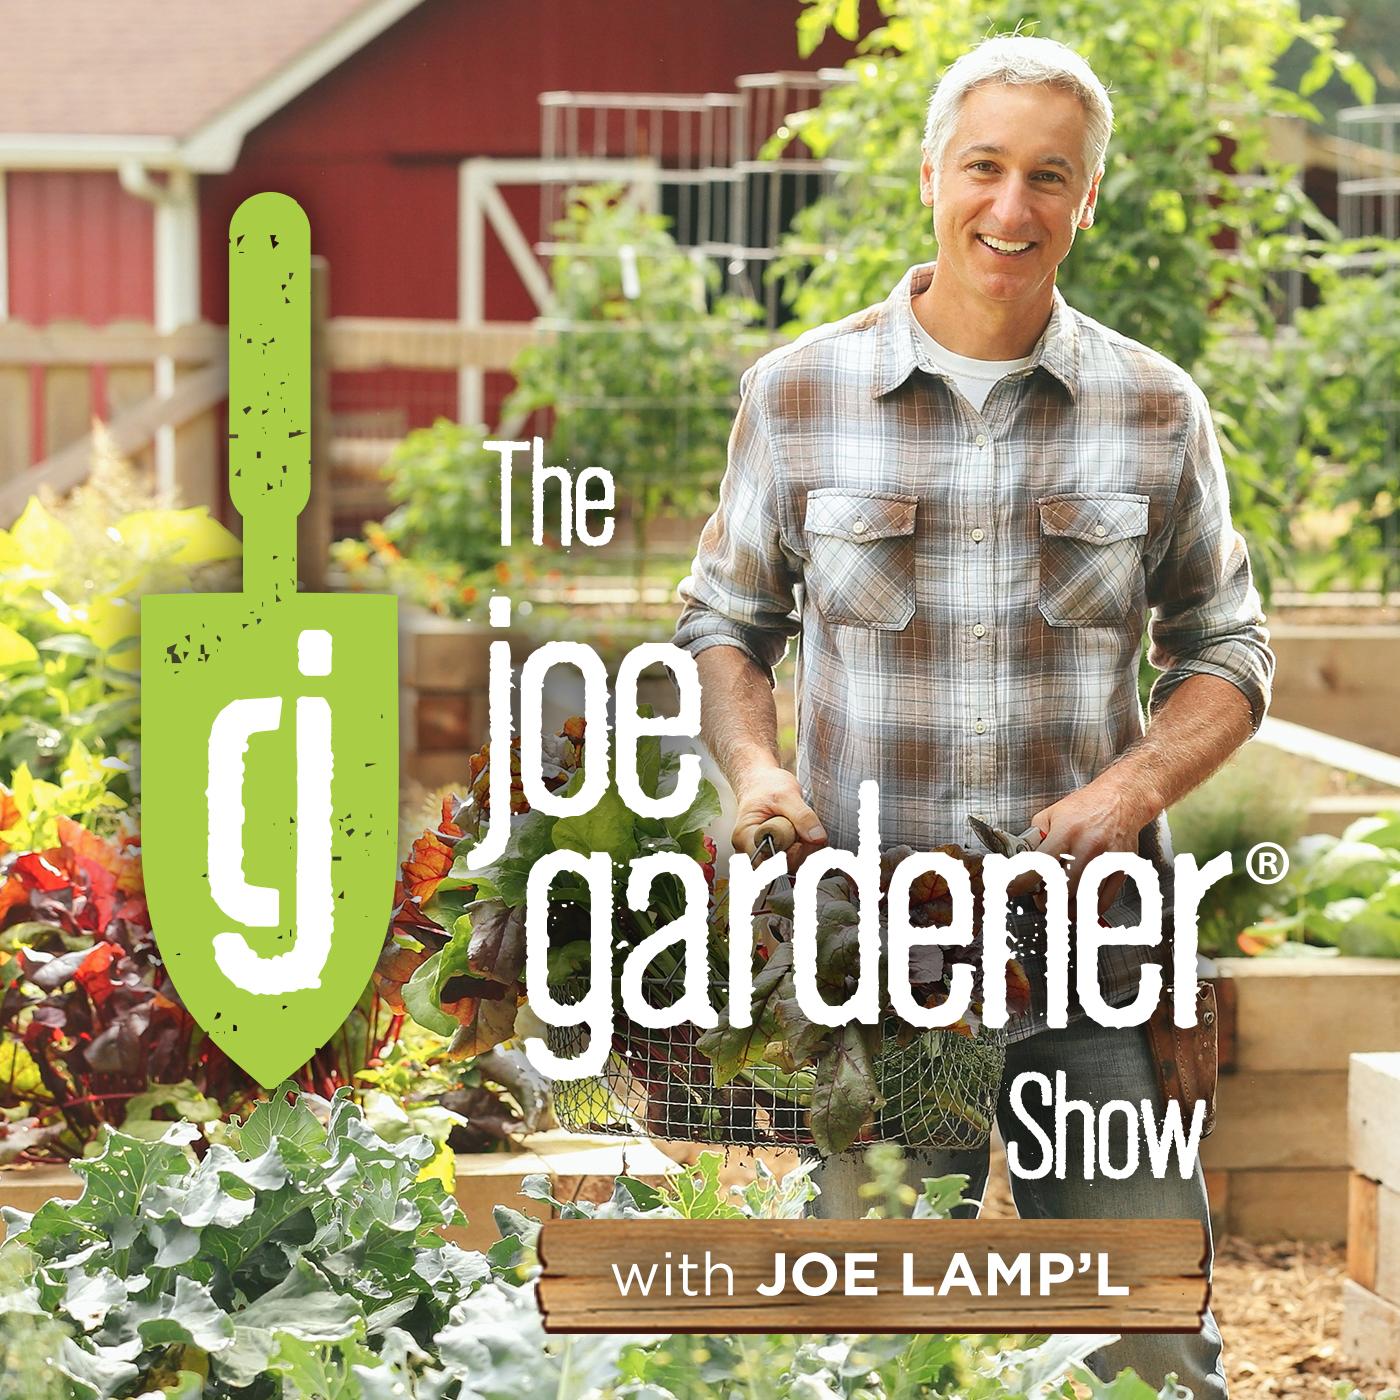 The joe gardener Show - Organic Gardening - Vegetable Gardening - Expert Garden Advice From Joe Lamp'l